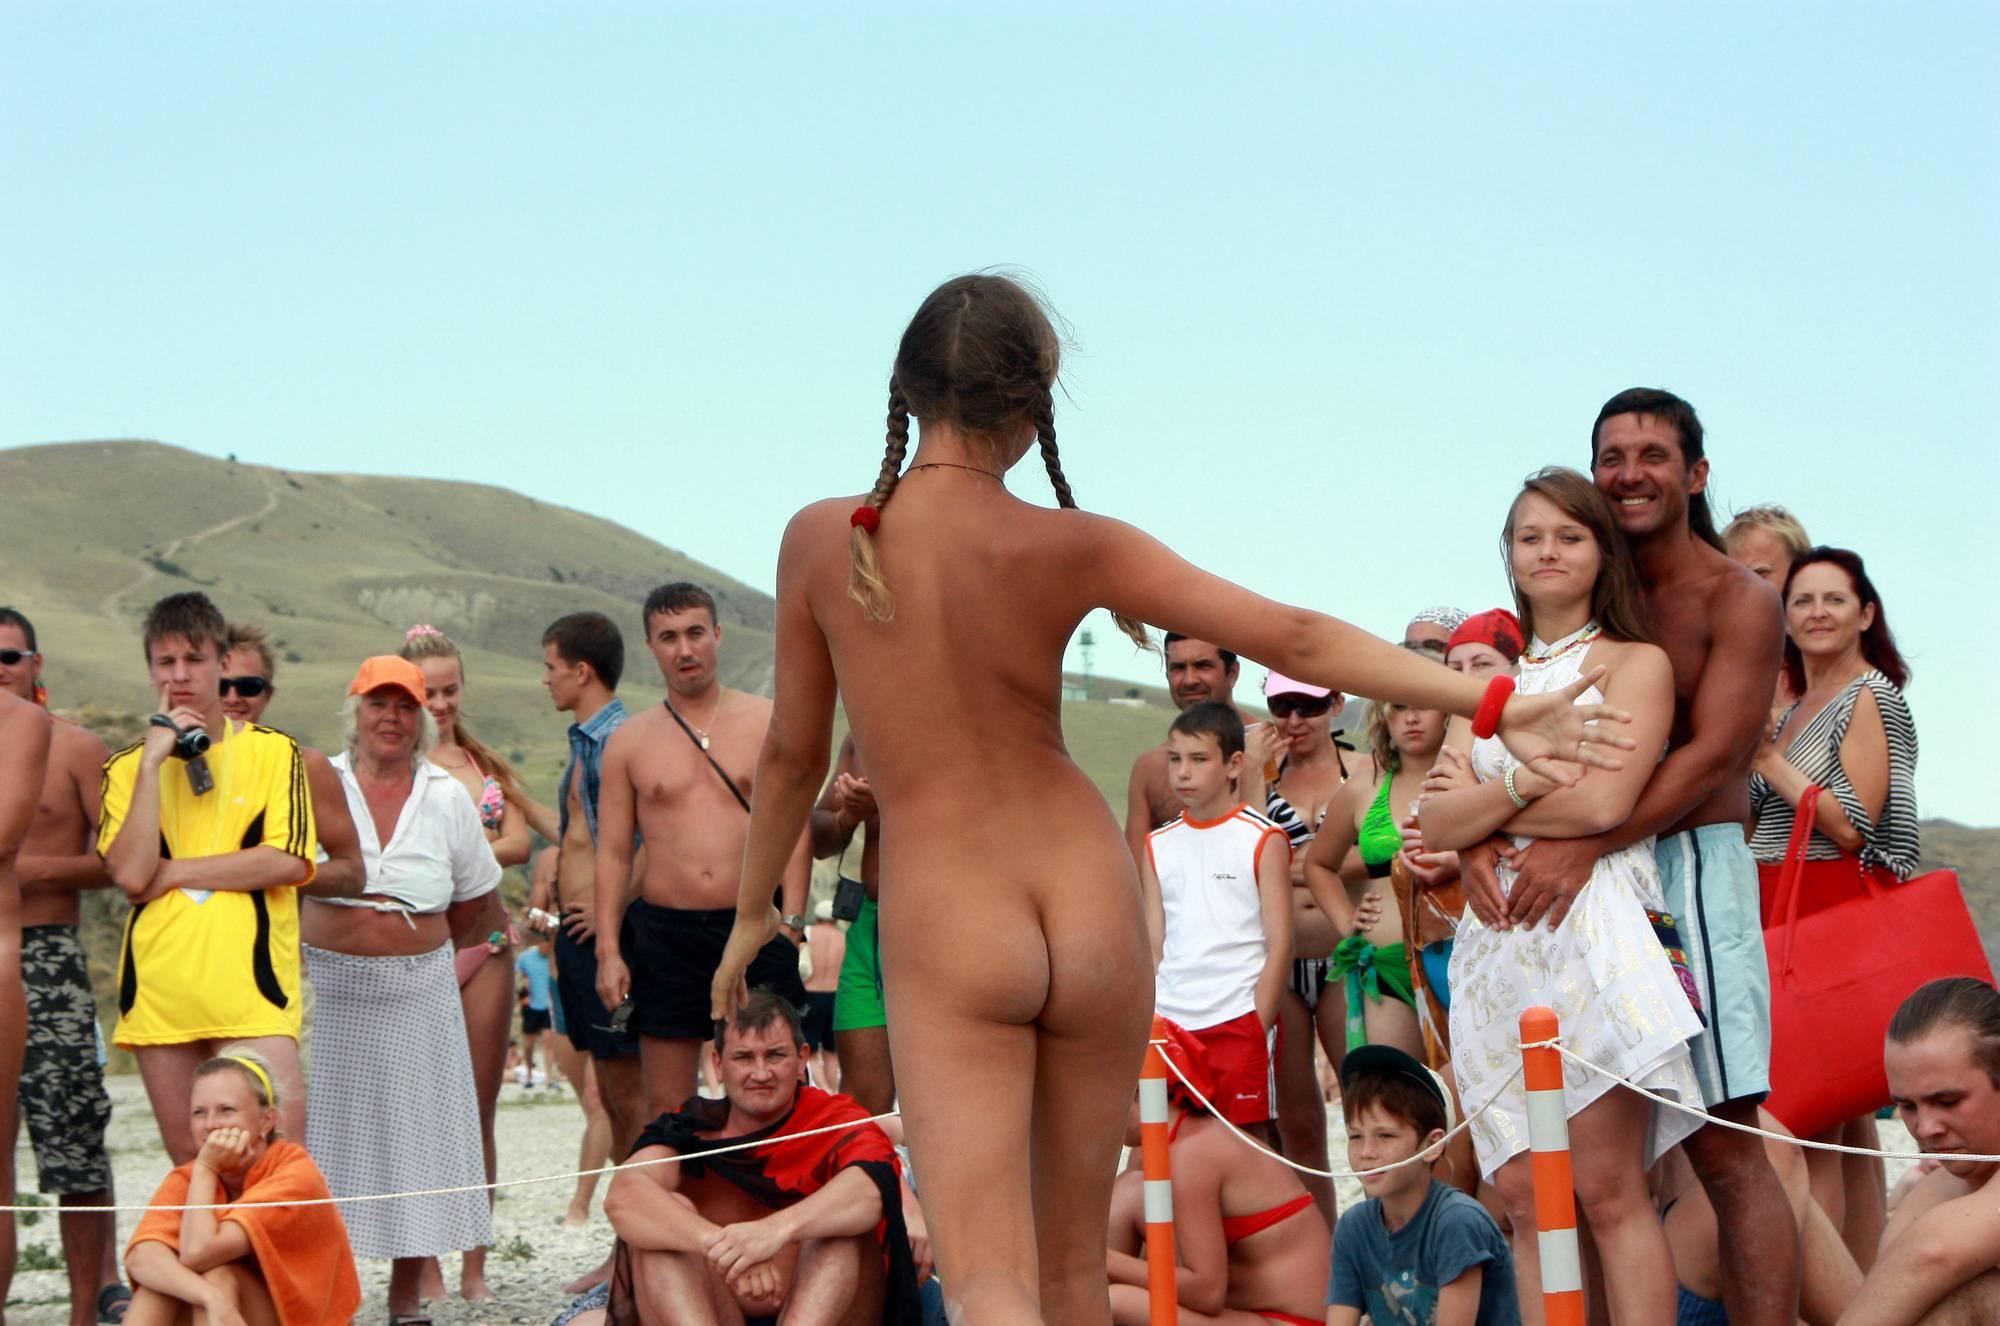 Nudist Gallery Nudist Braid Beach Stride - 2